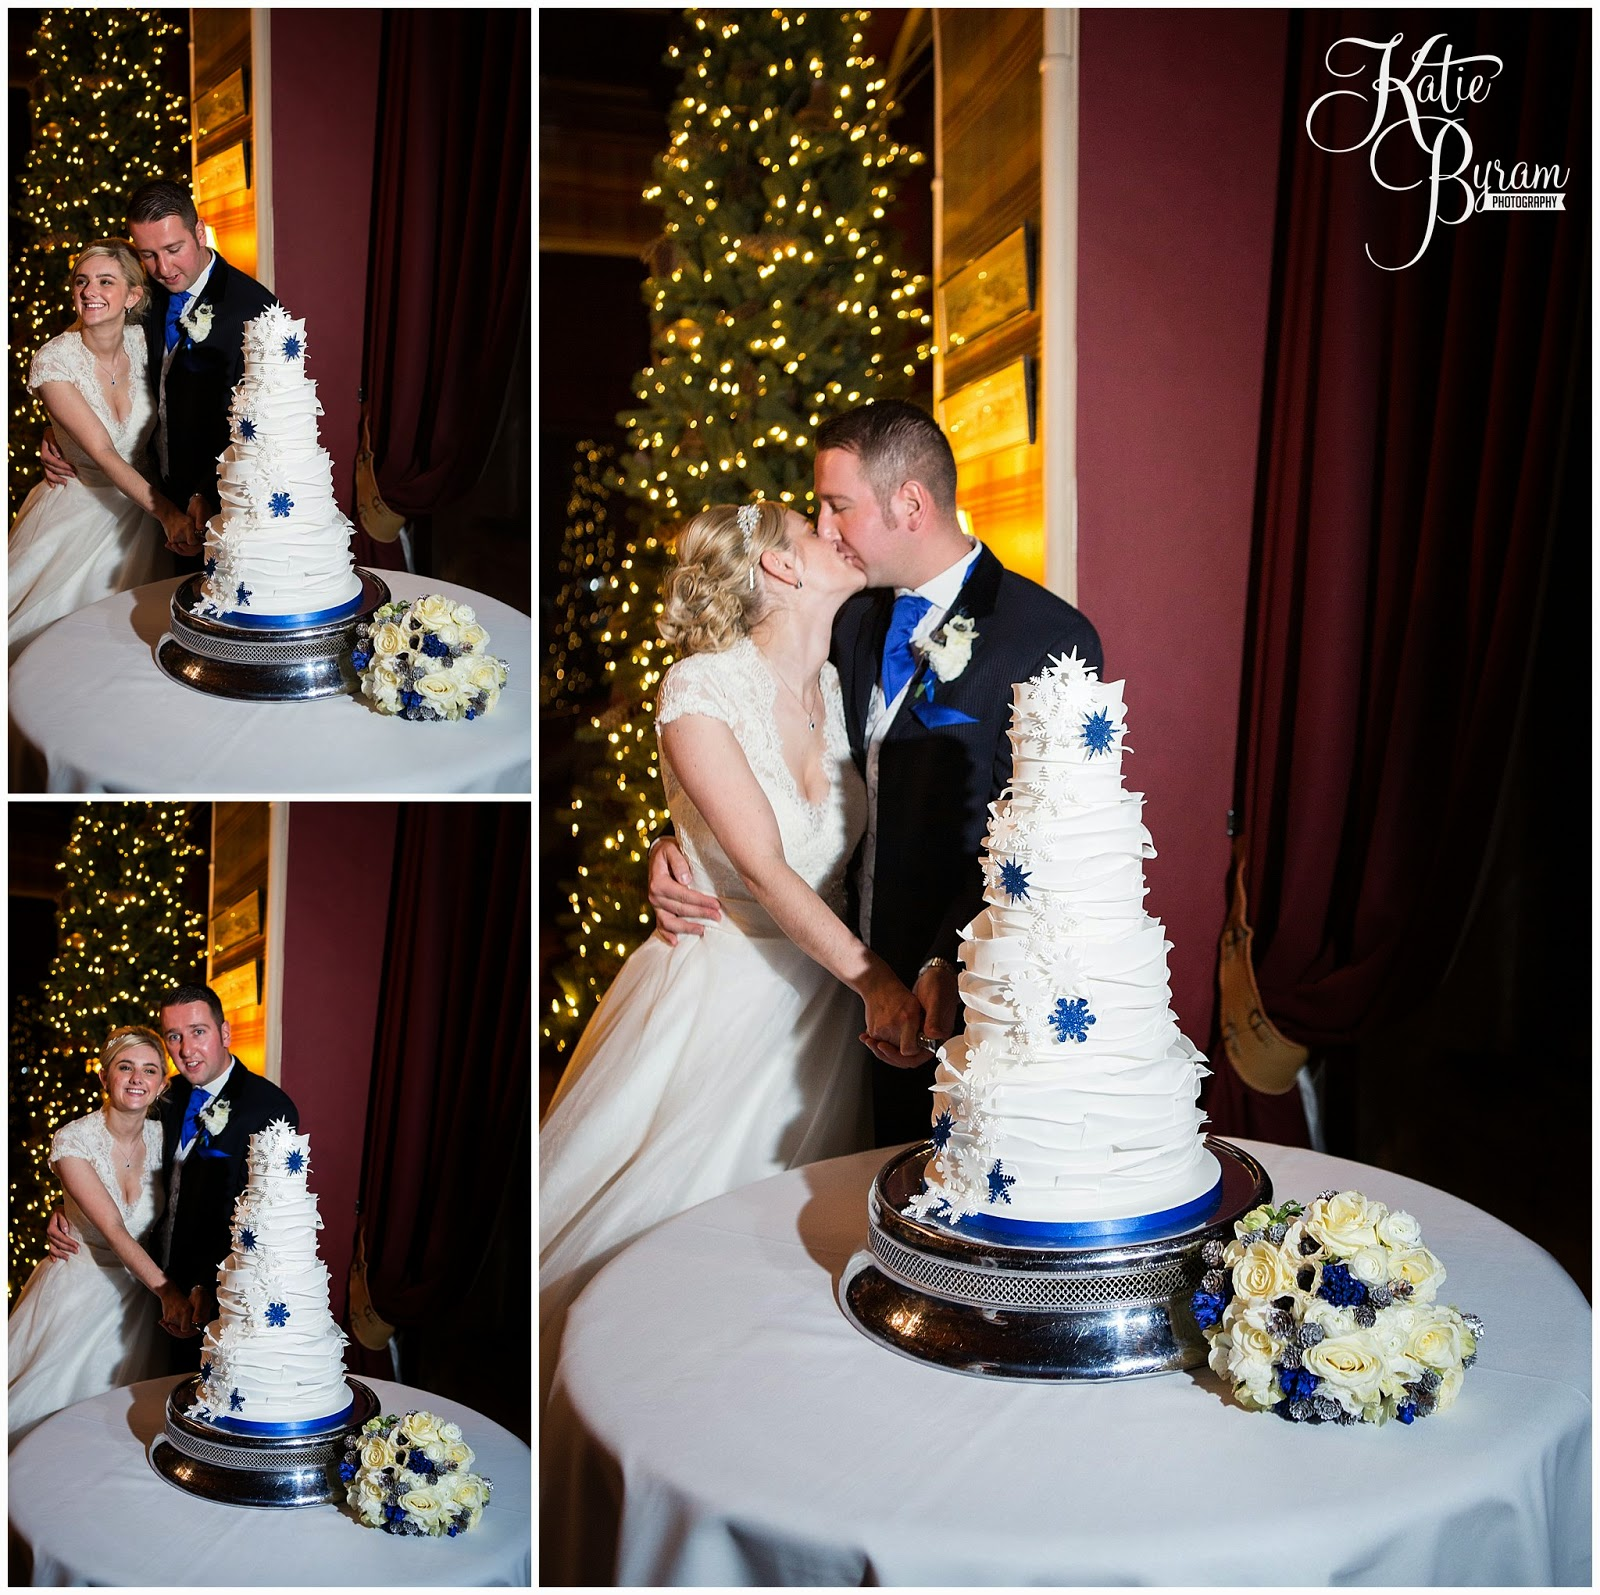 the master cakesmith, snowflake cake, ,  ellingham hall, ellingham hall wedding, katie byram photography, alnwick treehouse wedding, alnwick garden wedding, alnwick wedding,